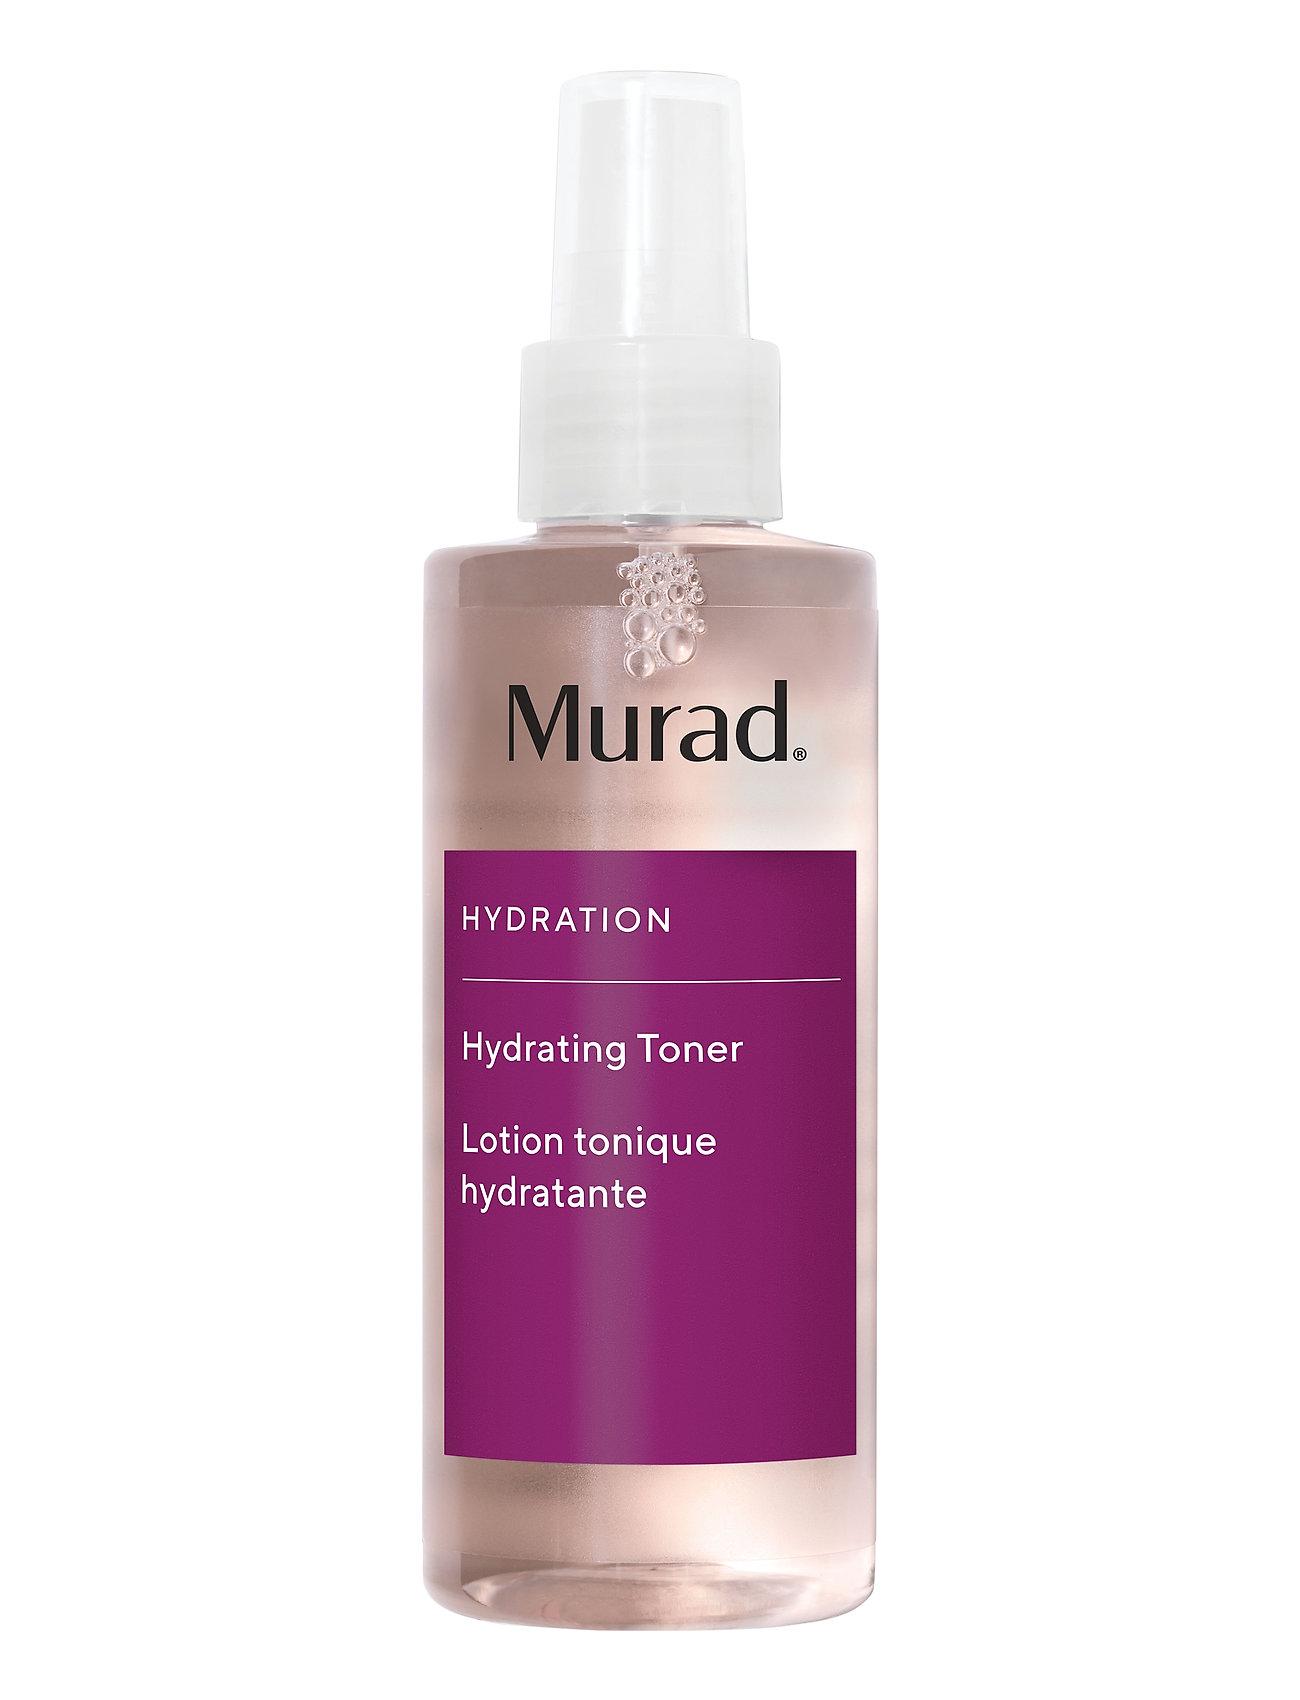 Murad Hydration Hydrating Toner - NO COLOUR